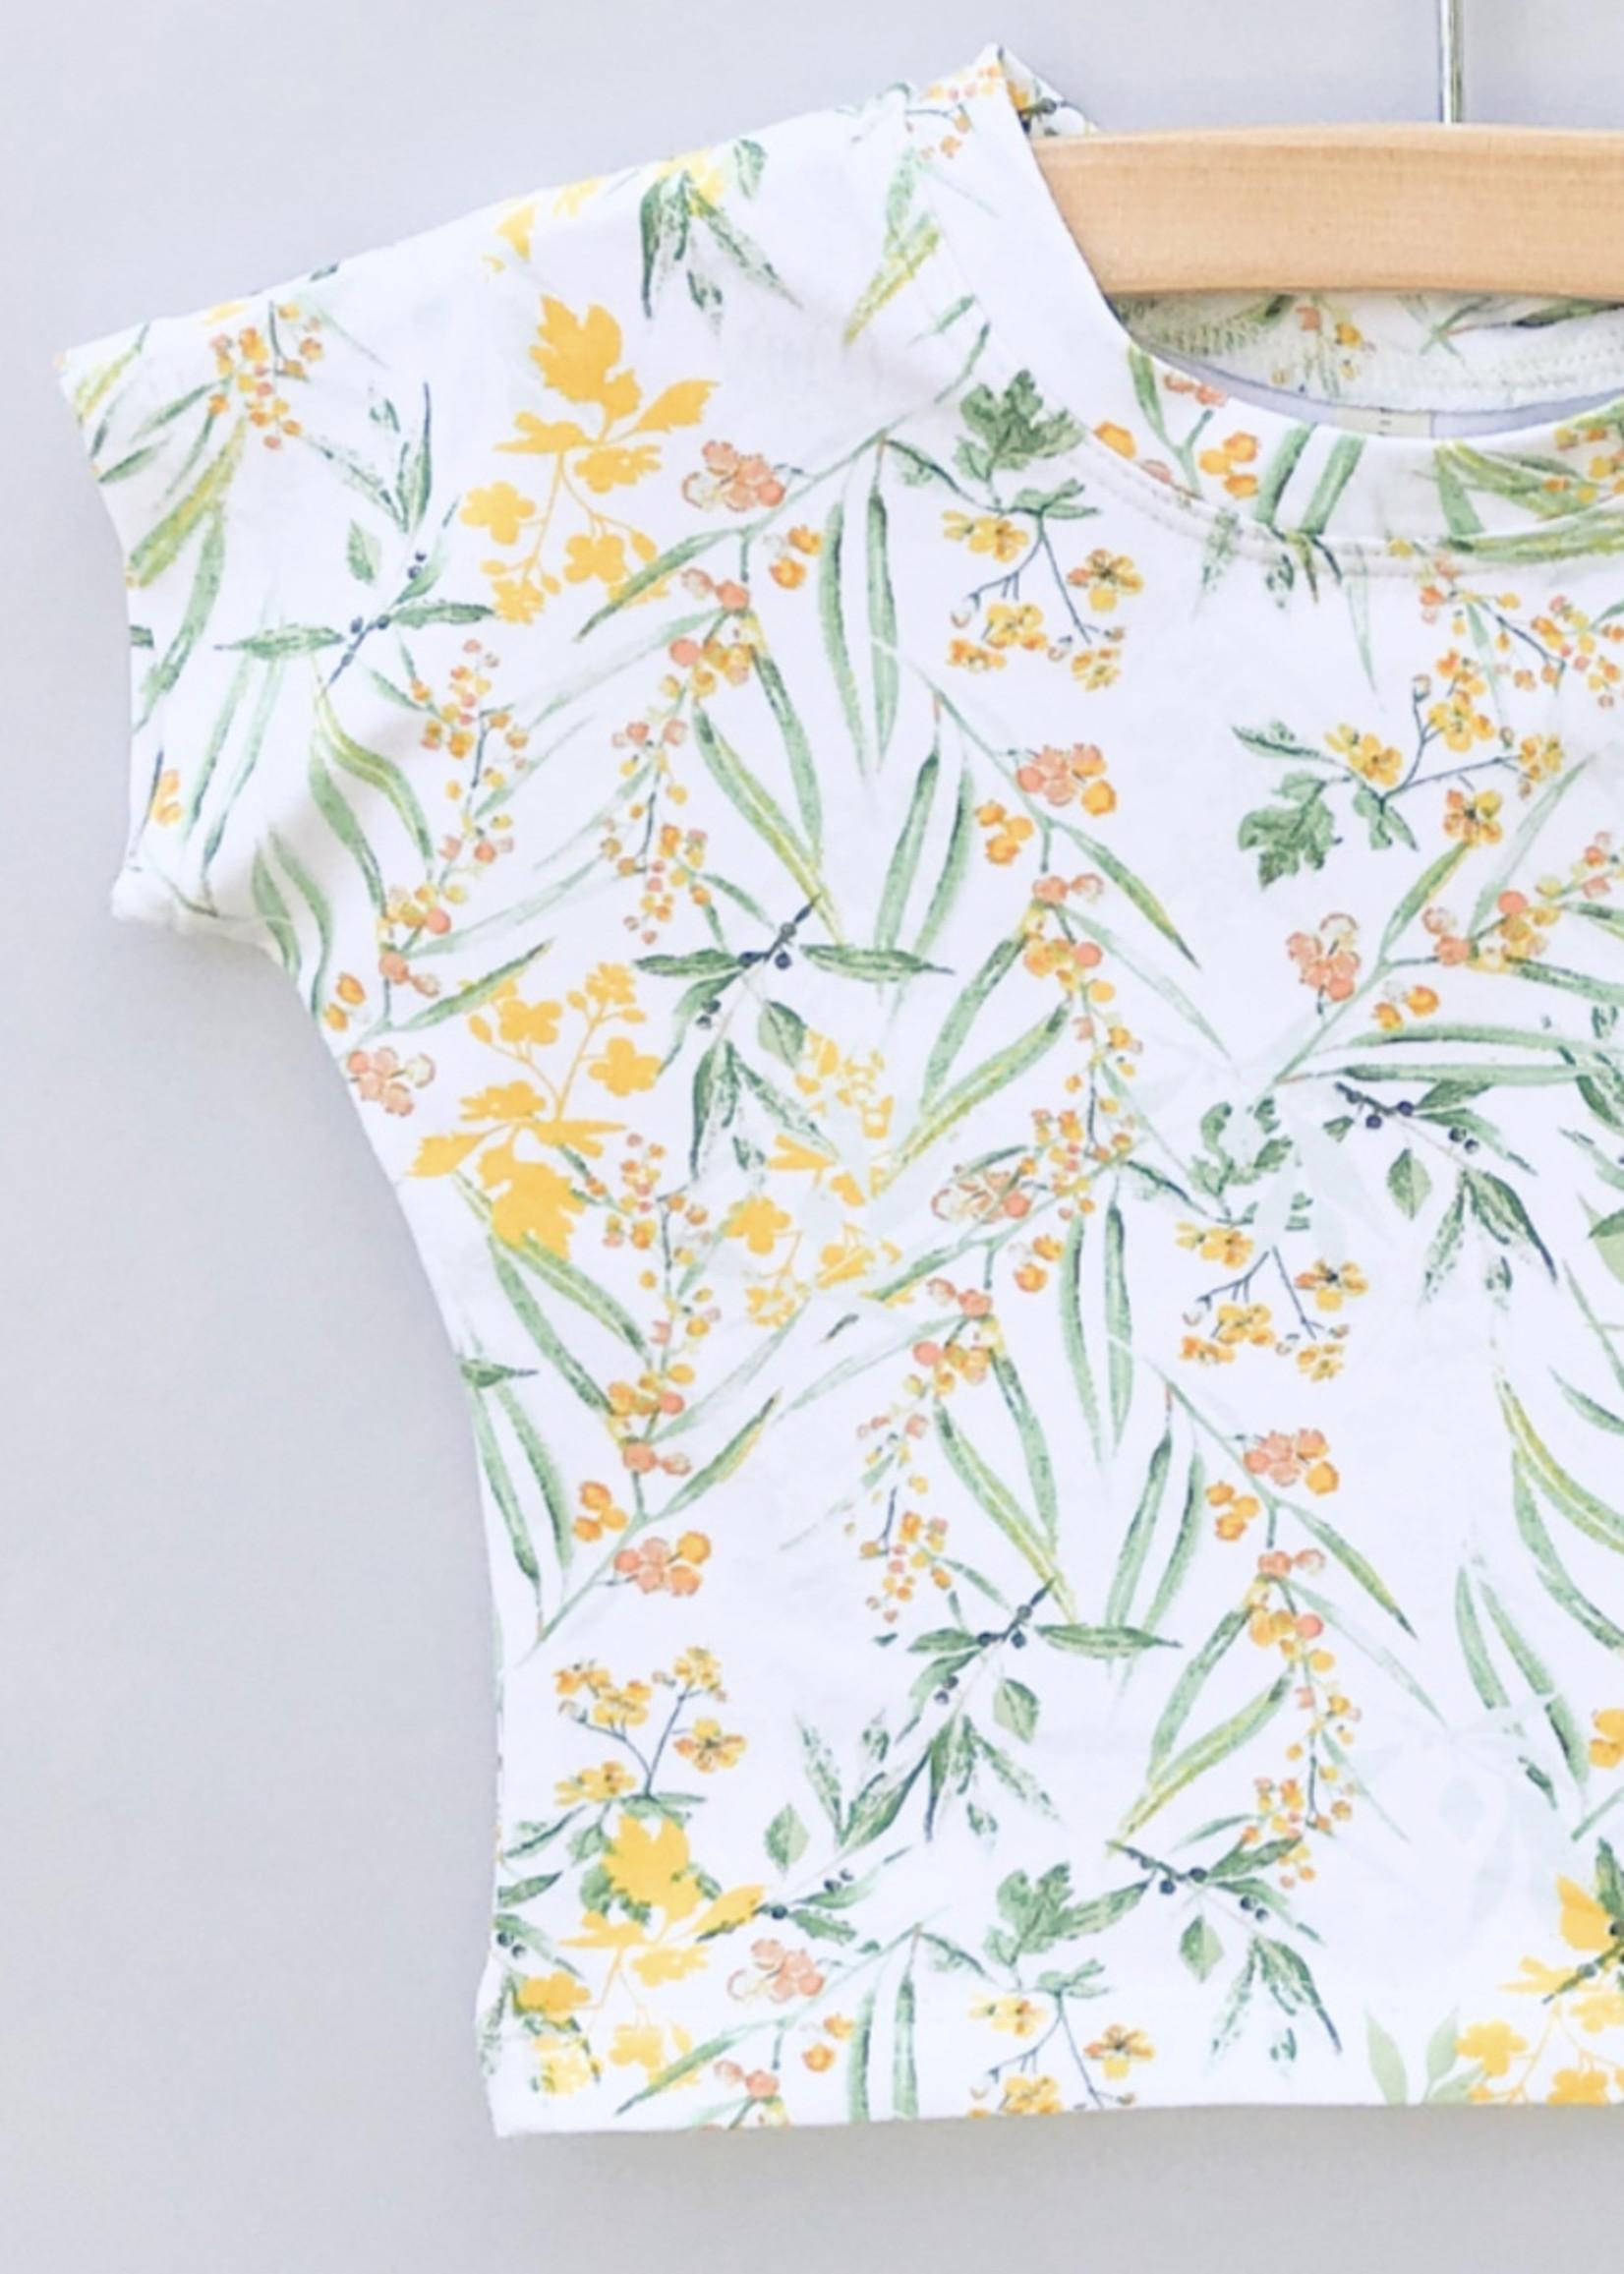 Jack Davis apparel Wildflower Box Tee